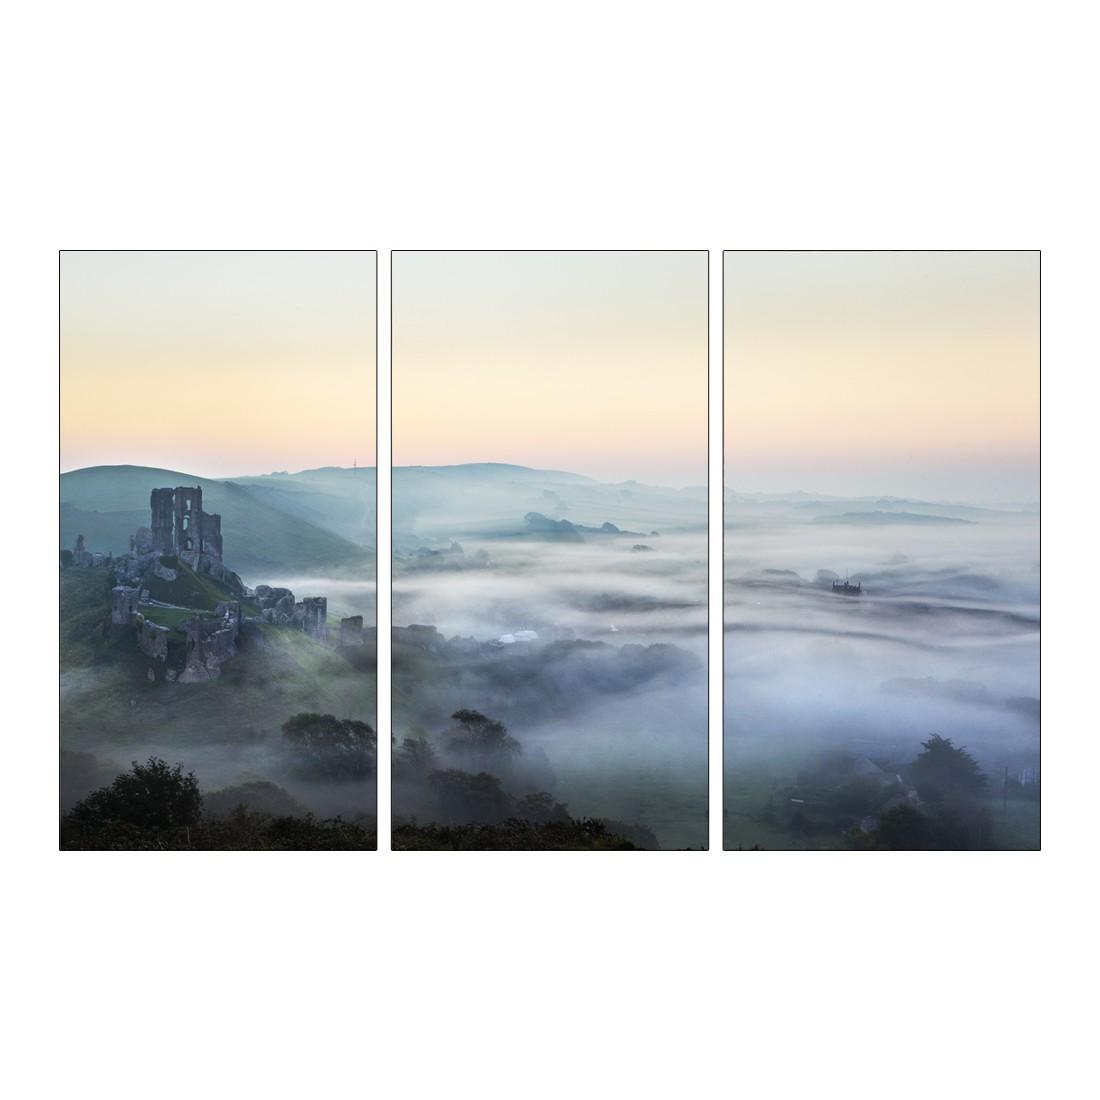 Leinwandbild MISTY MOUNTAIN RUINS  – Abmessung 130 x 80 cm, Gallery of Innovative Art online kaufen